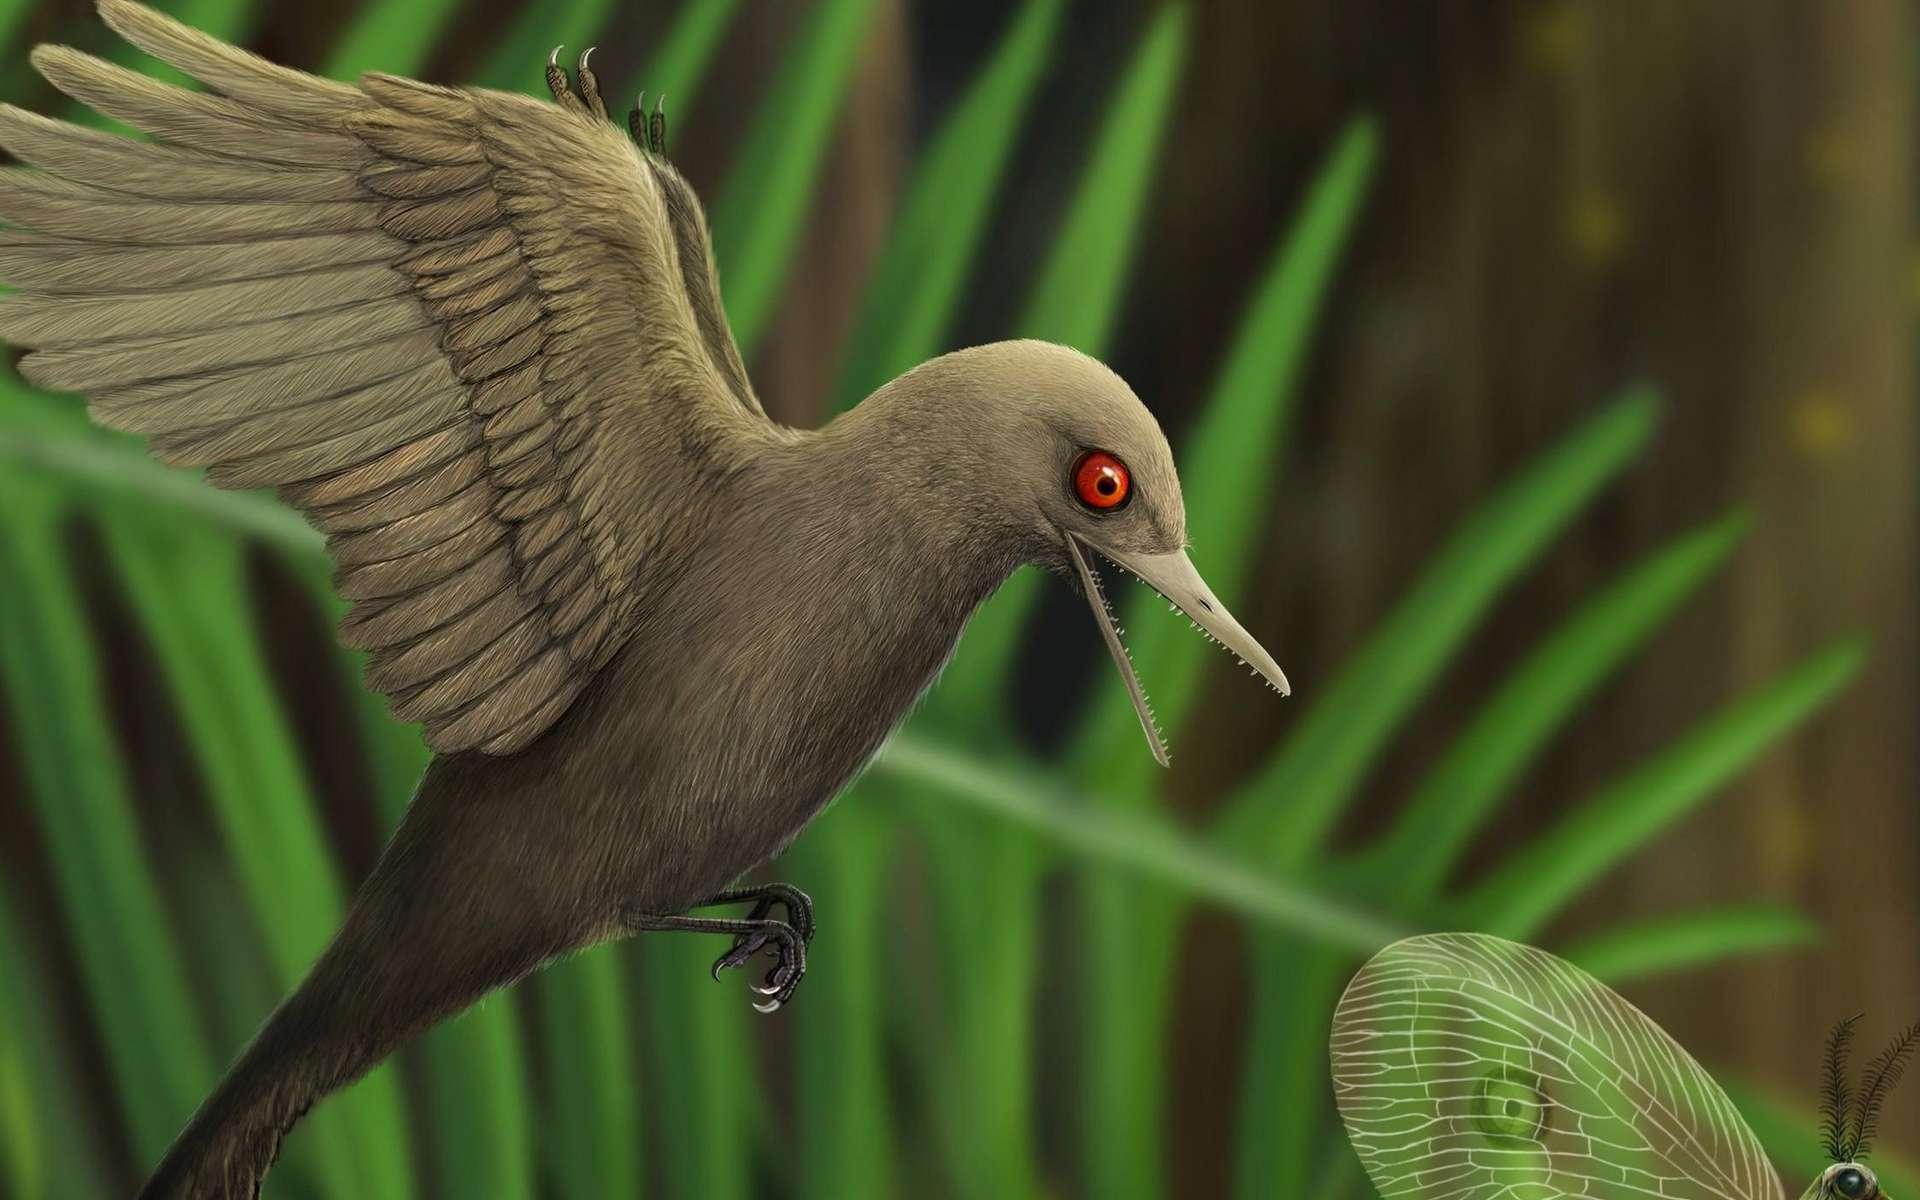 Oculudentavis khaungraae, un minuscule dinosaure à tête d'oiseau. © HAN Zhixin, Los Angeles Natural History Museum